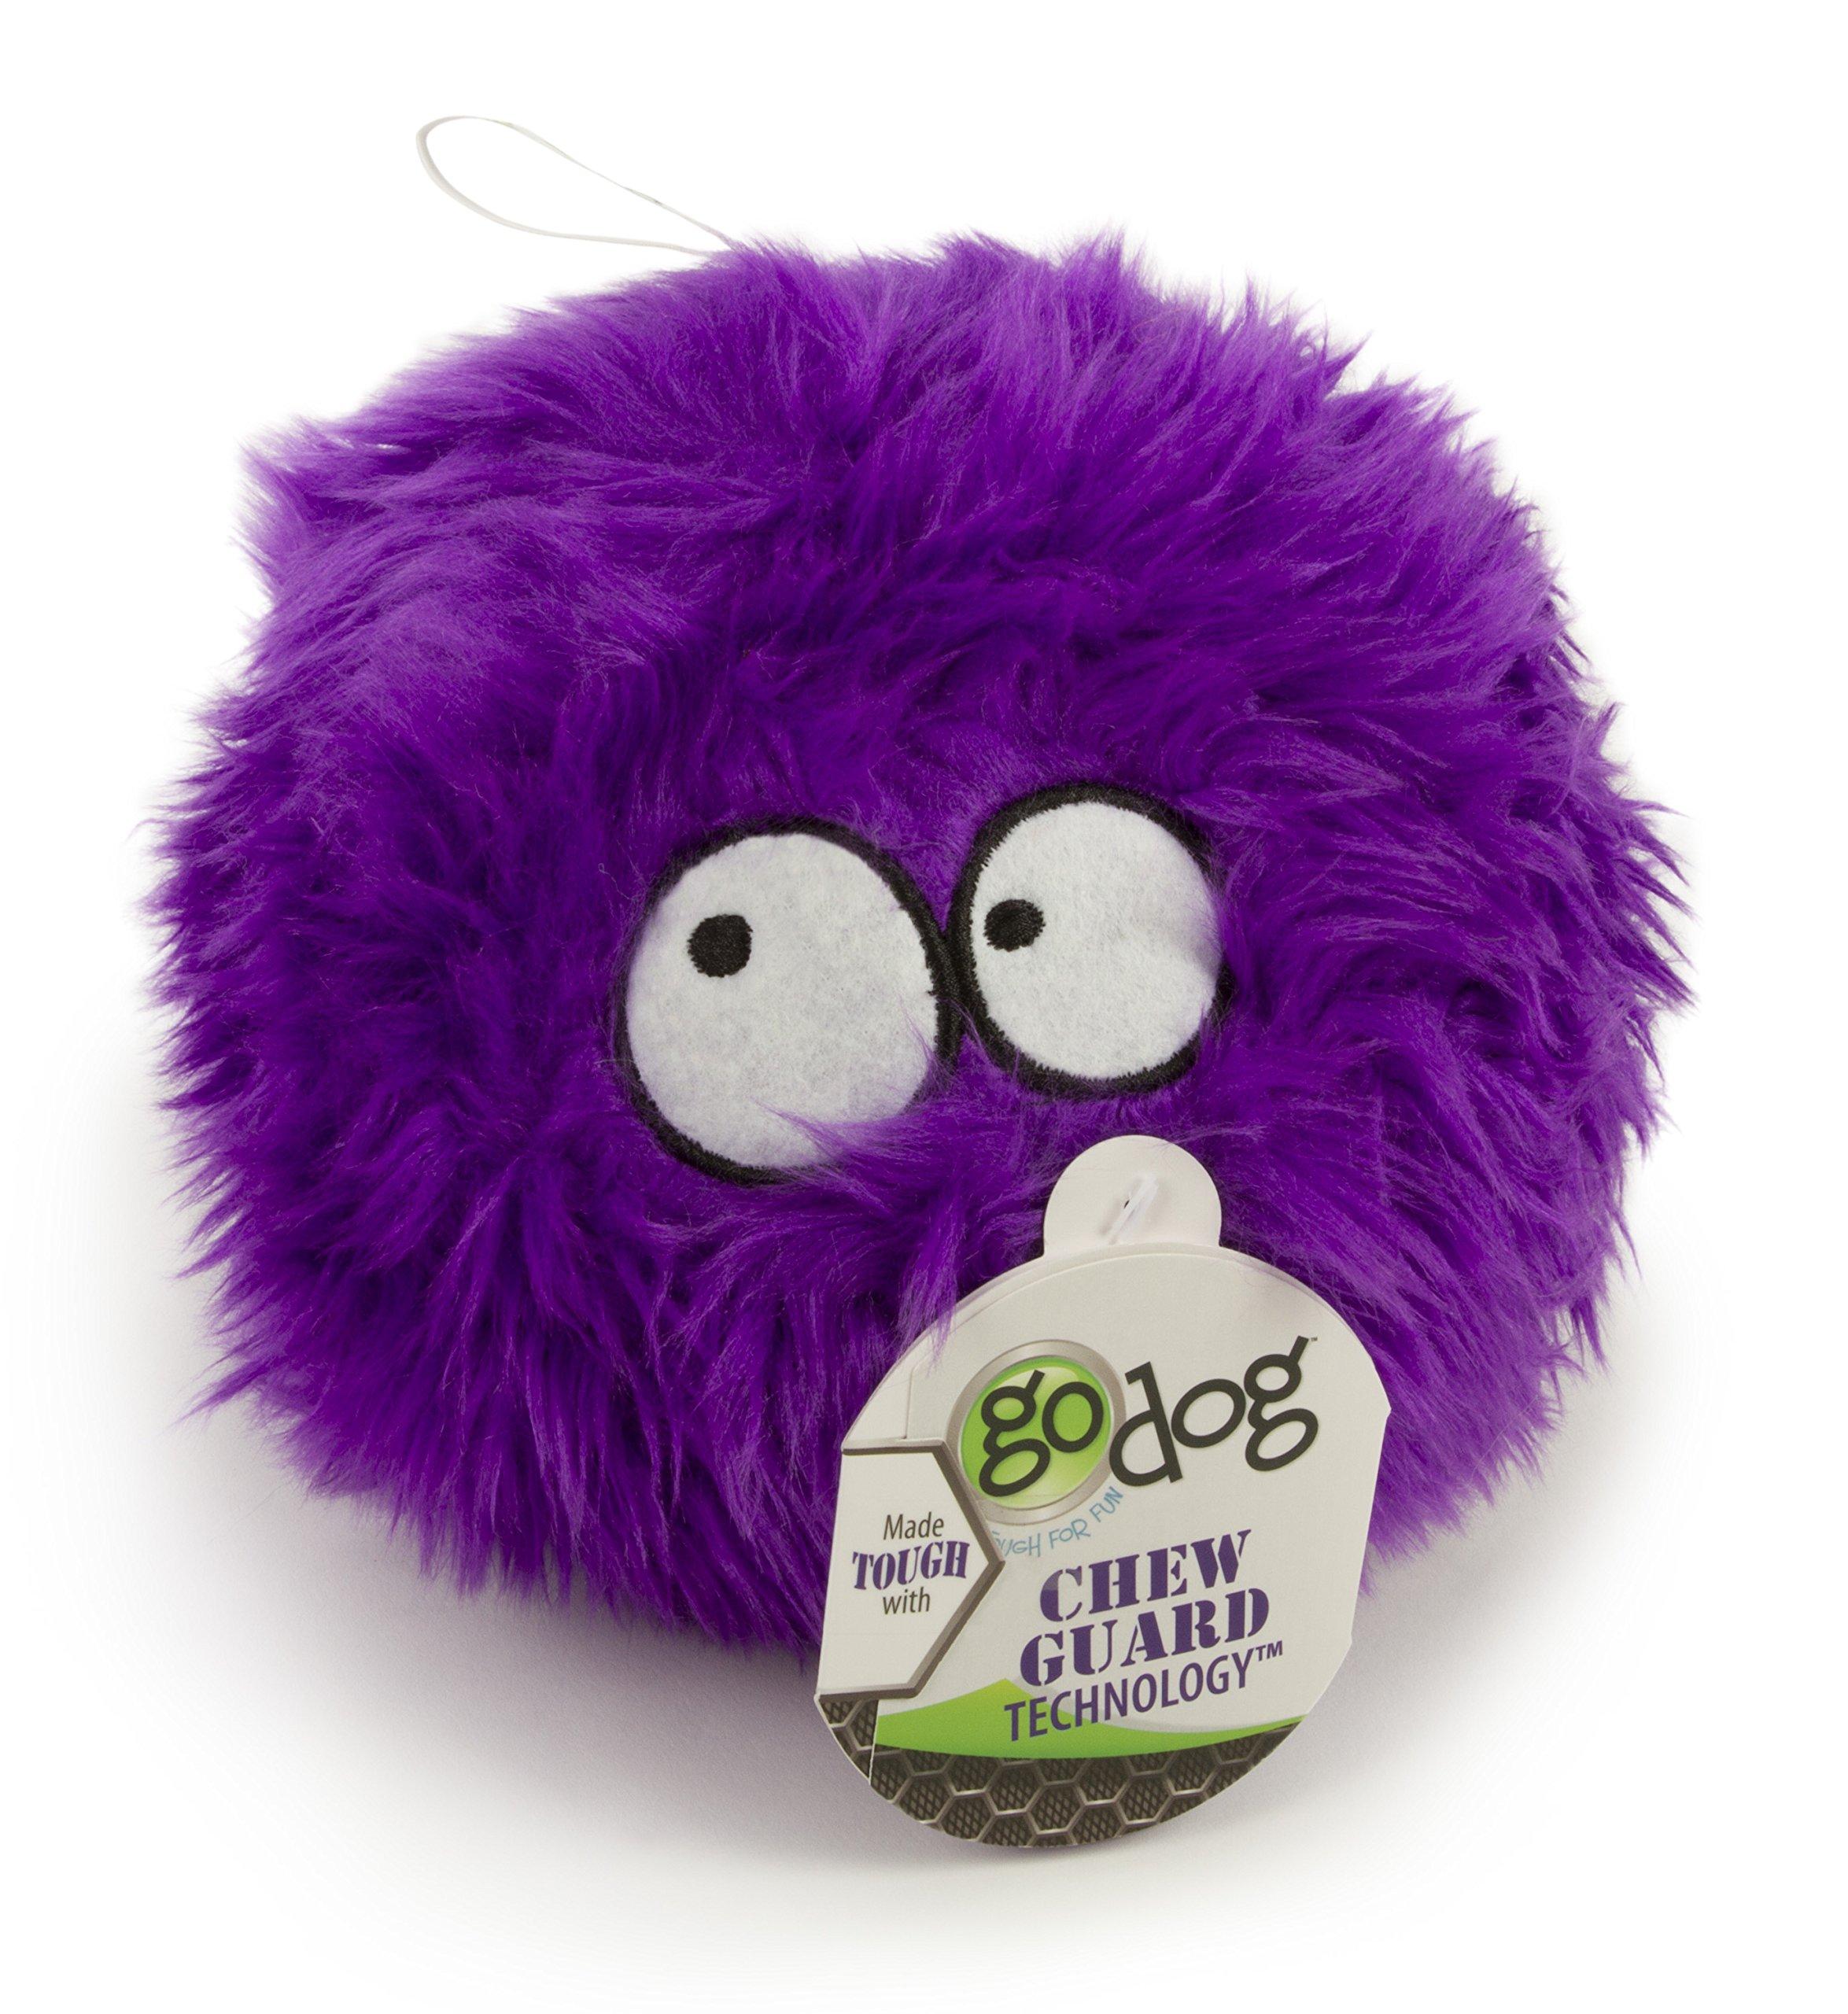 goDog Furballz Tough Plush Dog Toy with Chew Guard Technology, Purple, Large